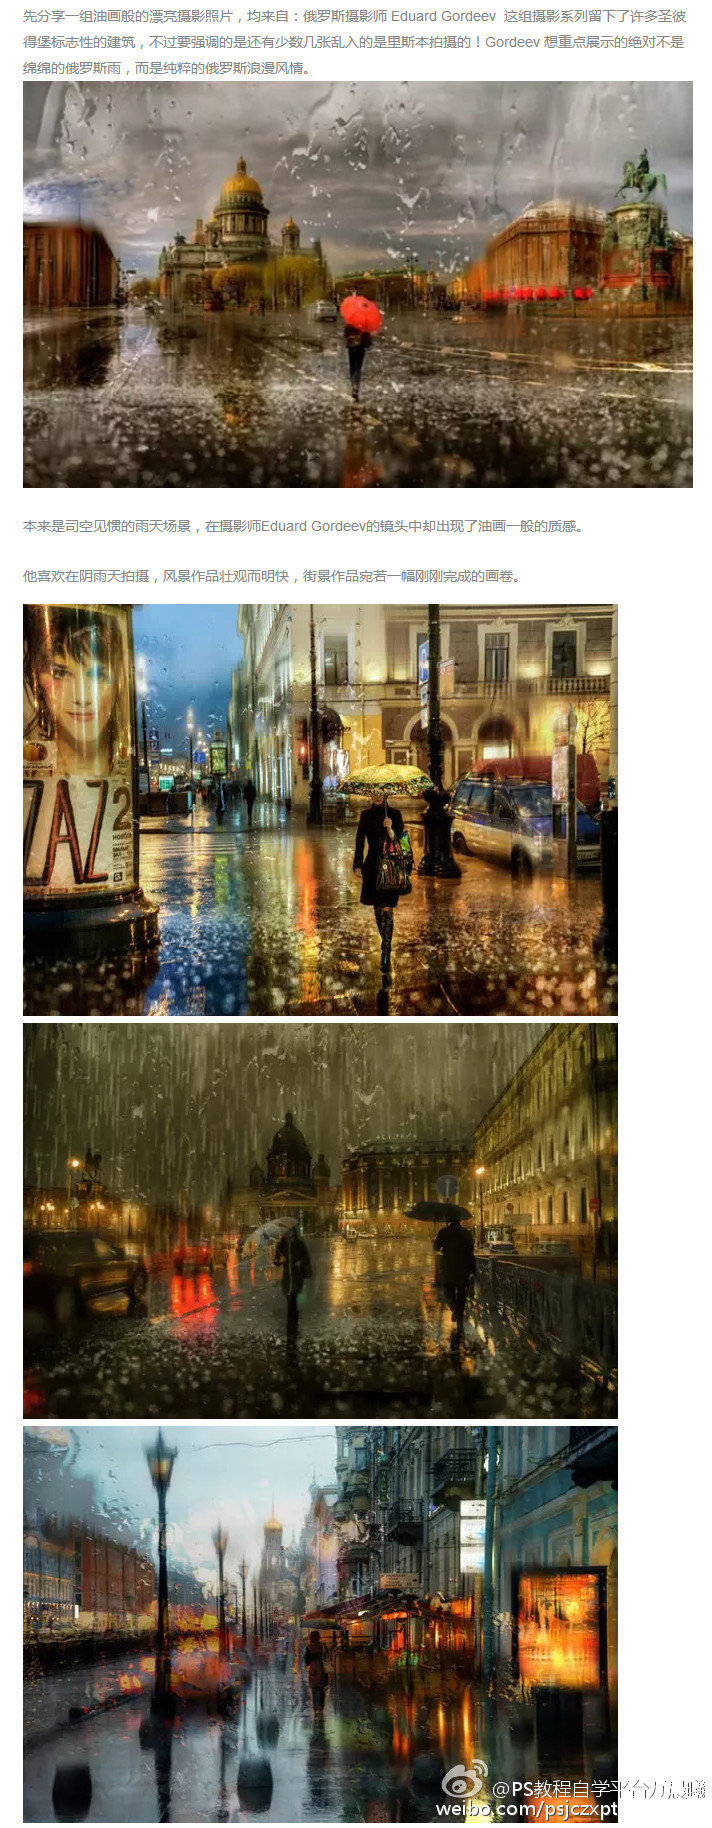 PS做出这种雨中油画的质感,教大家用ps做出这种雨中油画的质感